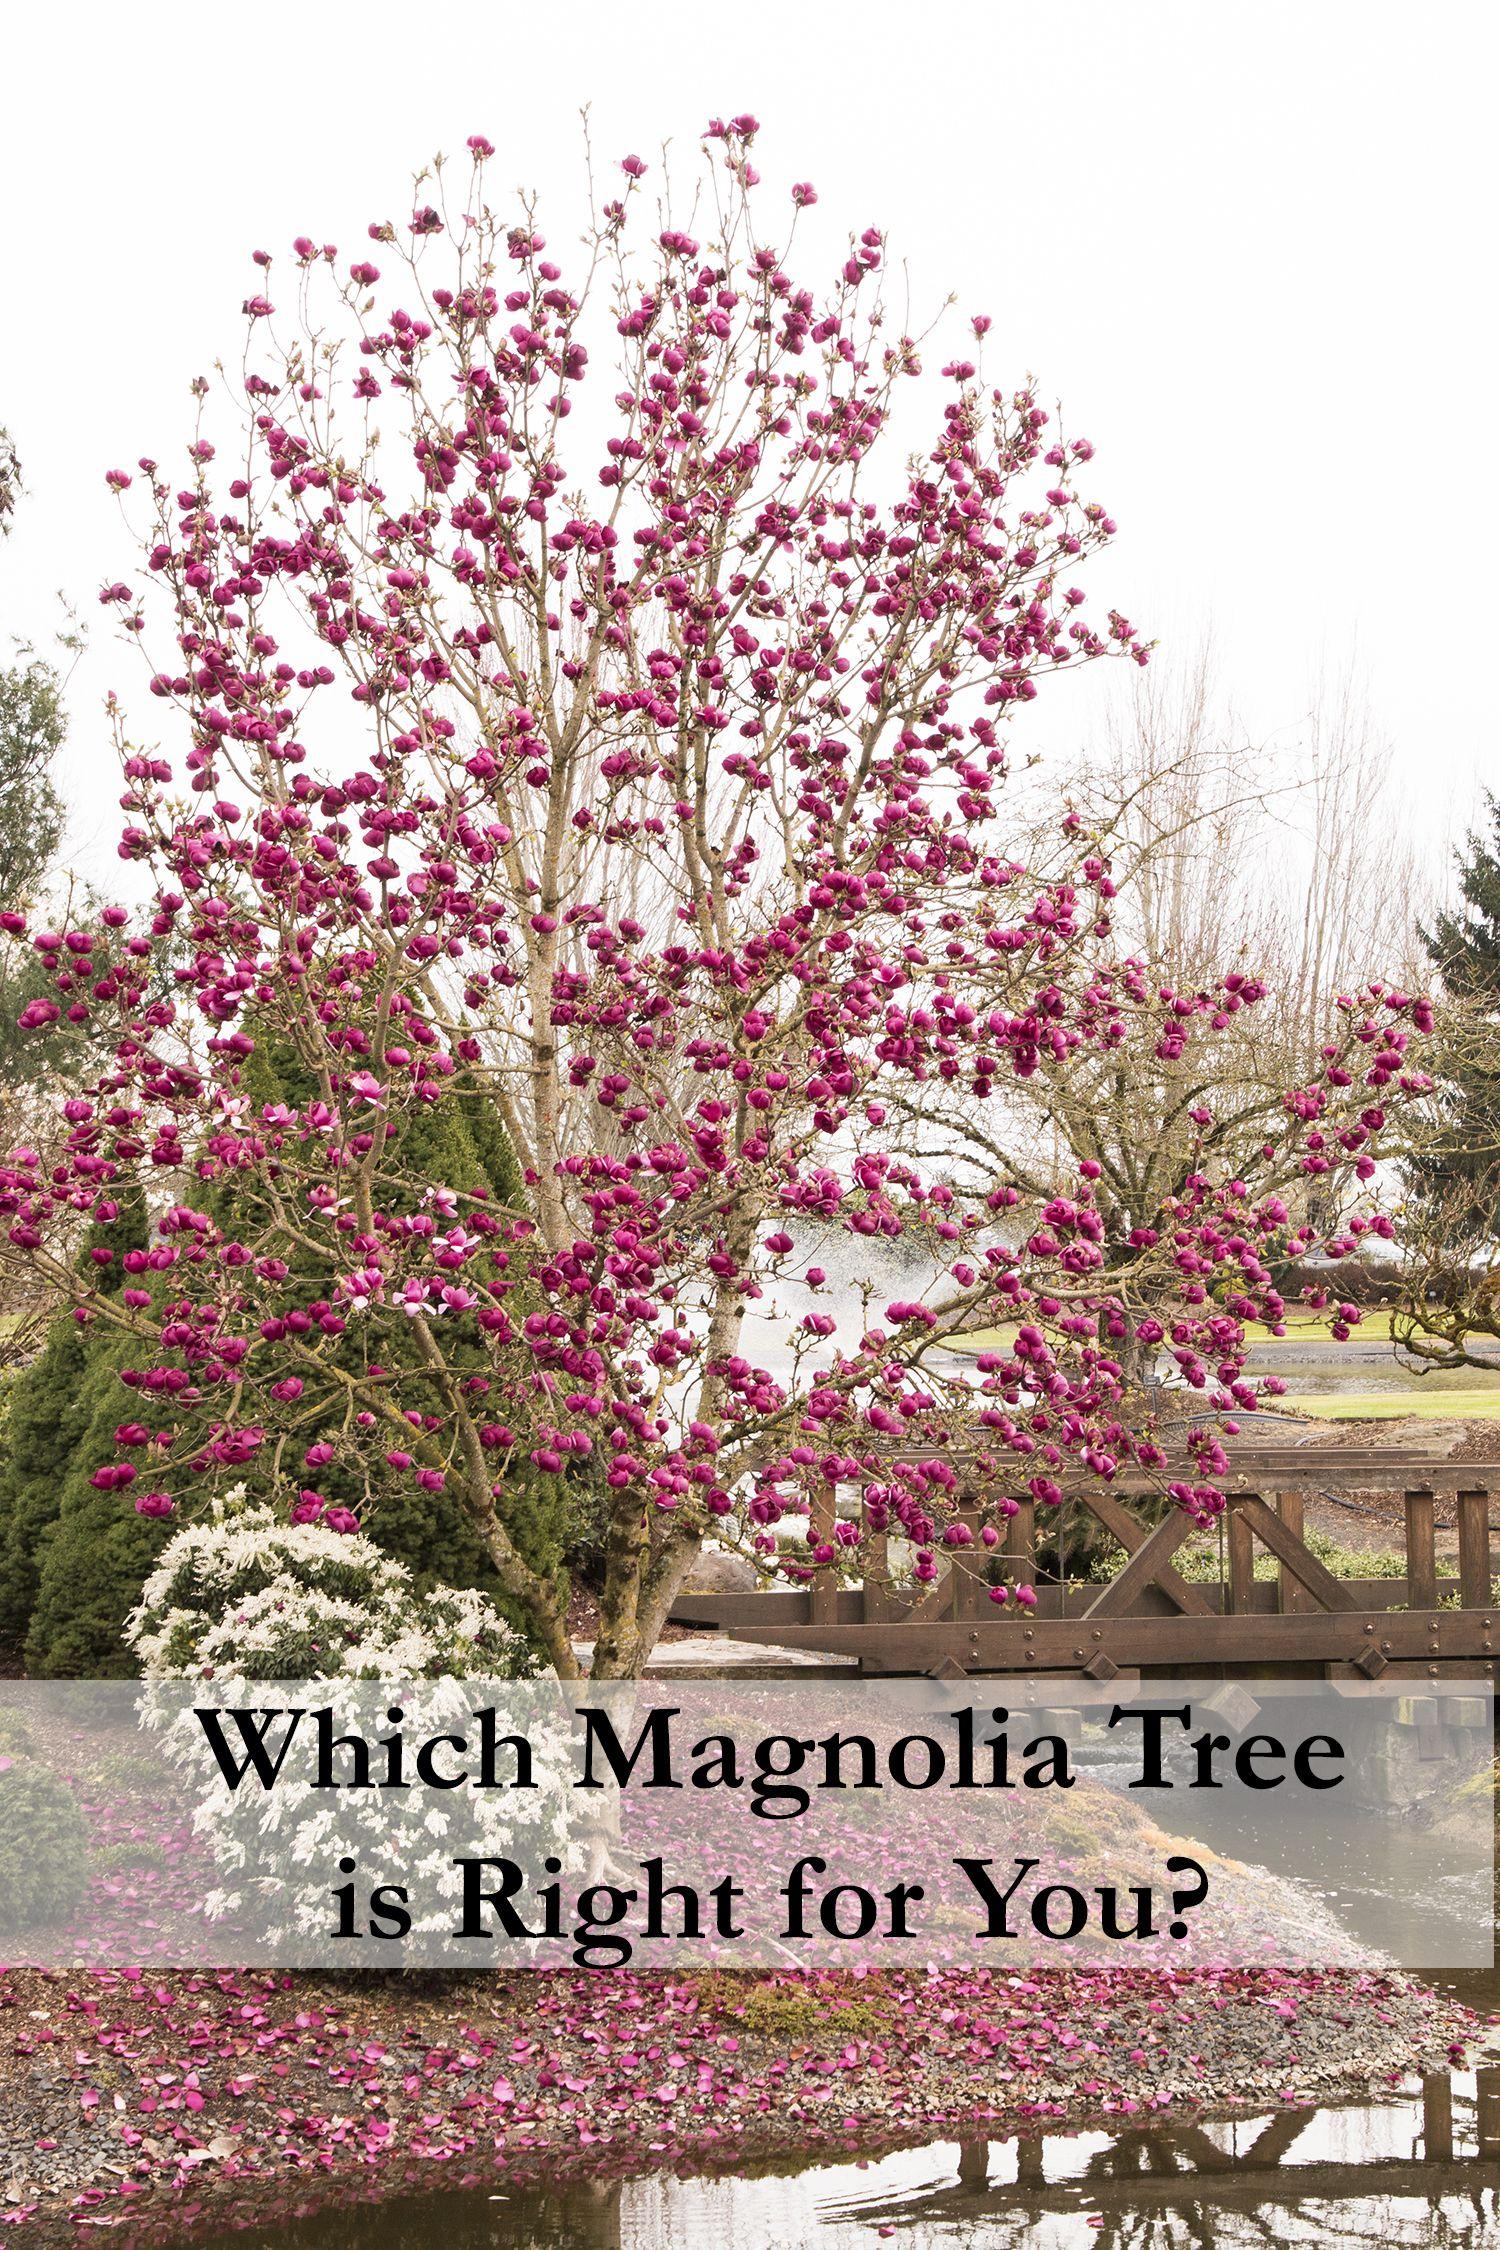 Find Black Tulip Magnolia In Indianapolis Carmel Fishers Lesville Geist Indiana At Allisonville Nursery